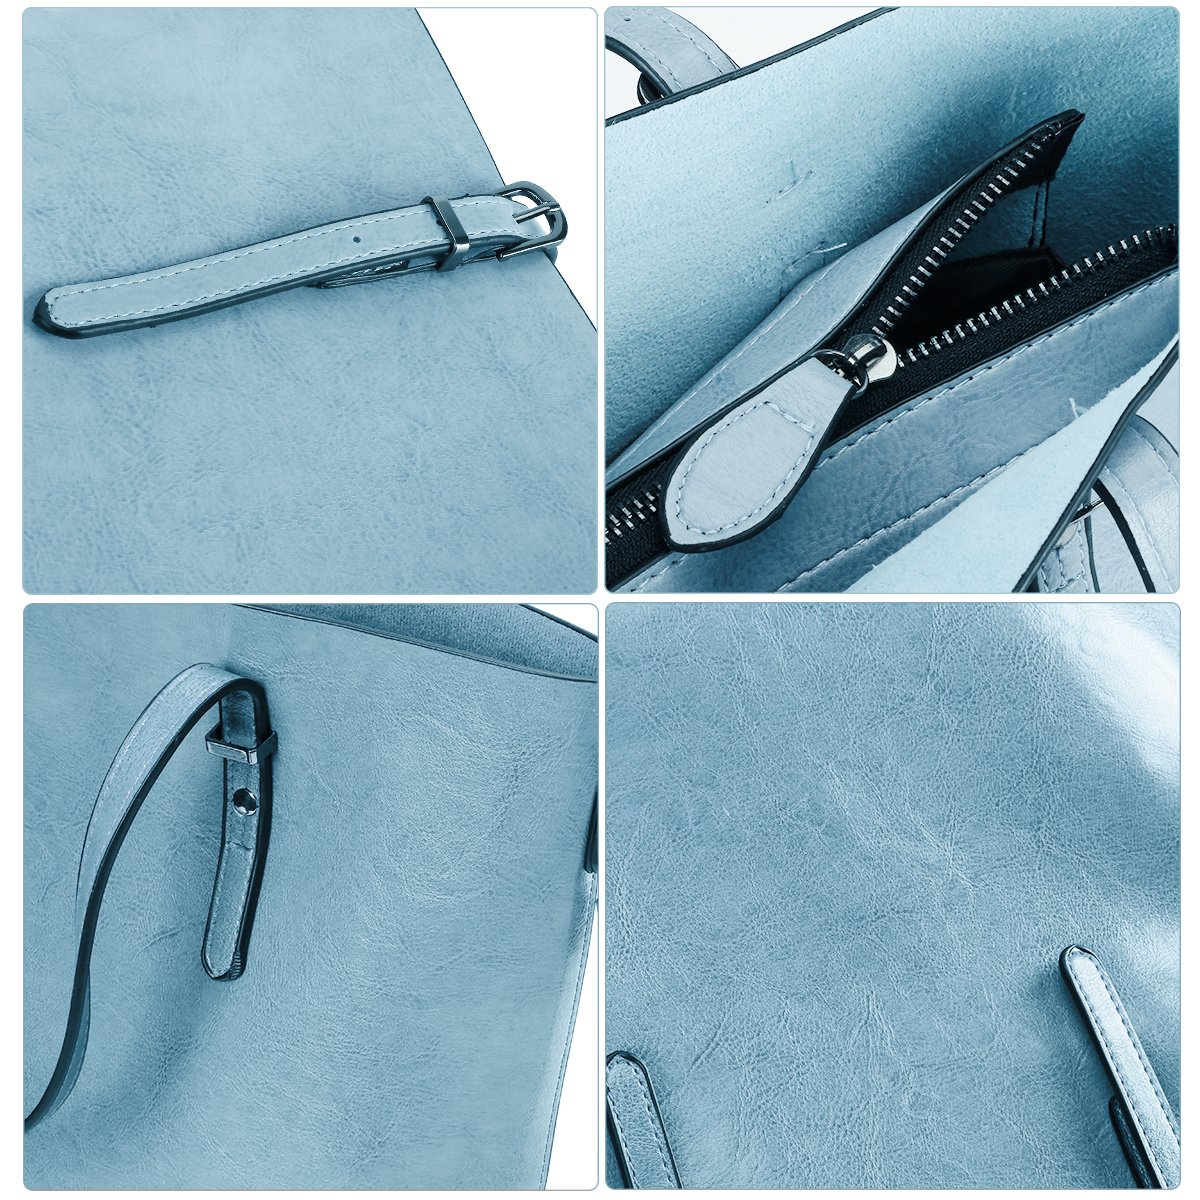 Women Top Handle Satchel Handbags Shoulder Bag Messenger Tote Bag Purse IUKIO (Light Blue) by IUKIO (Image #7)